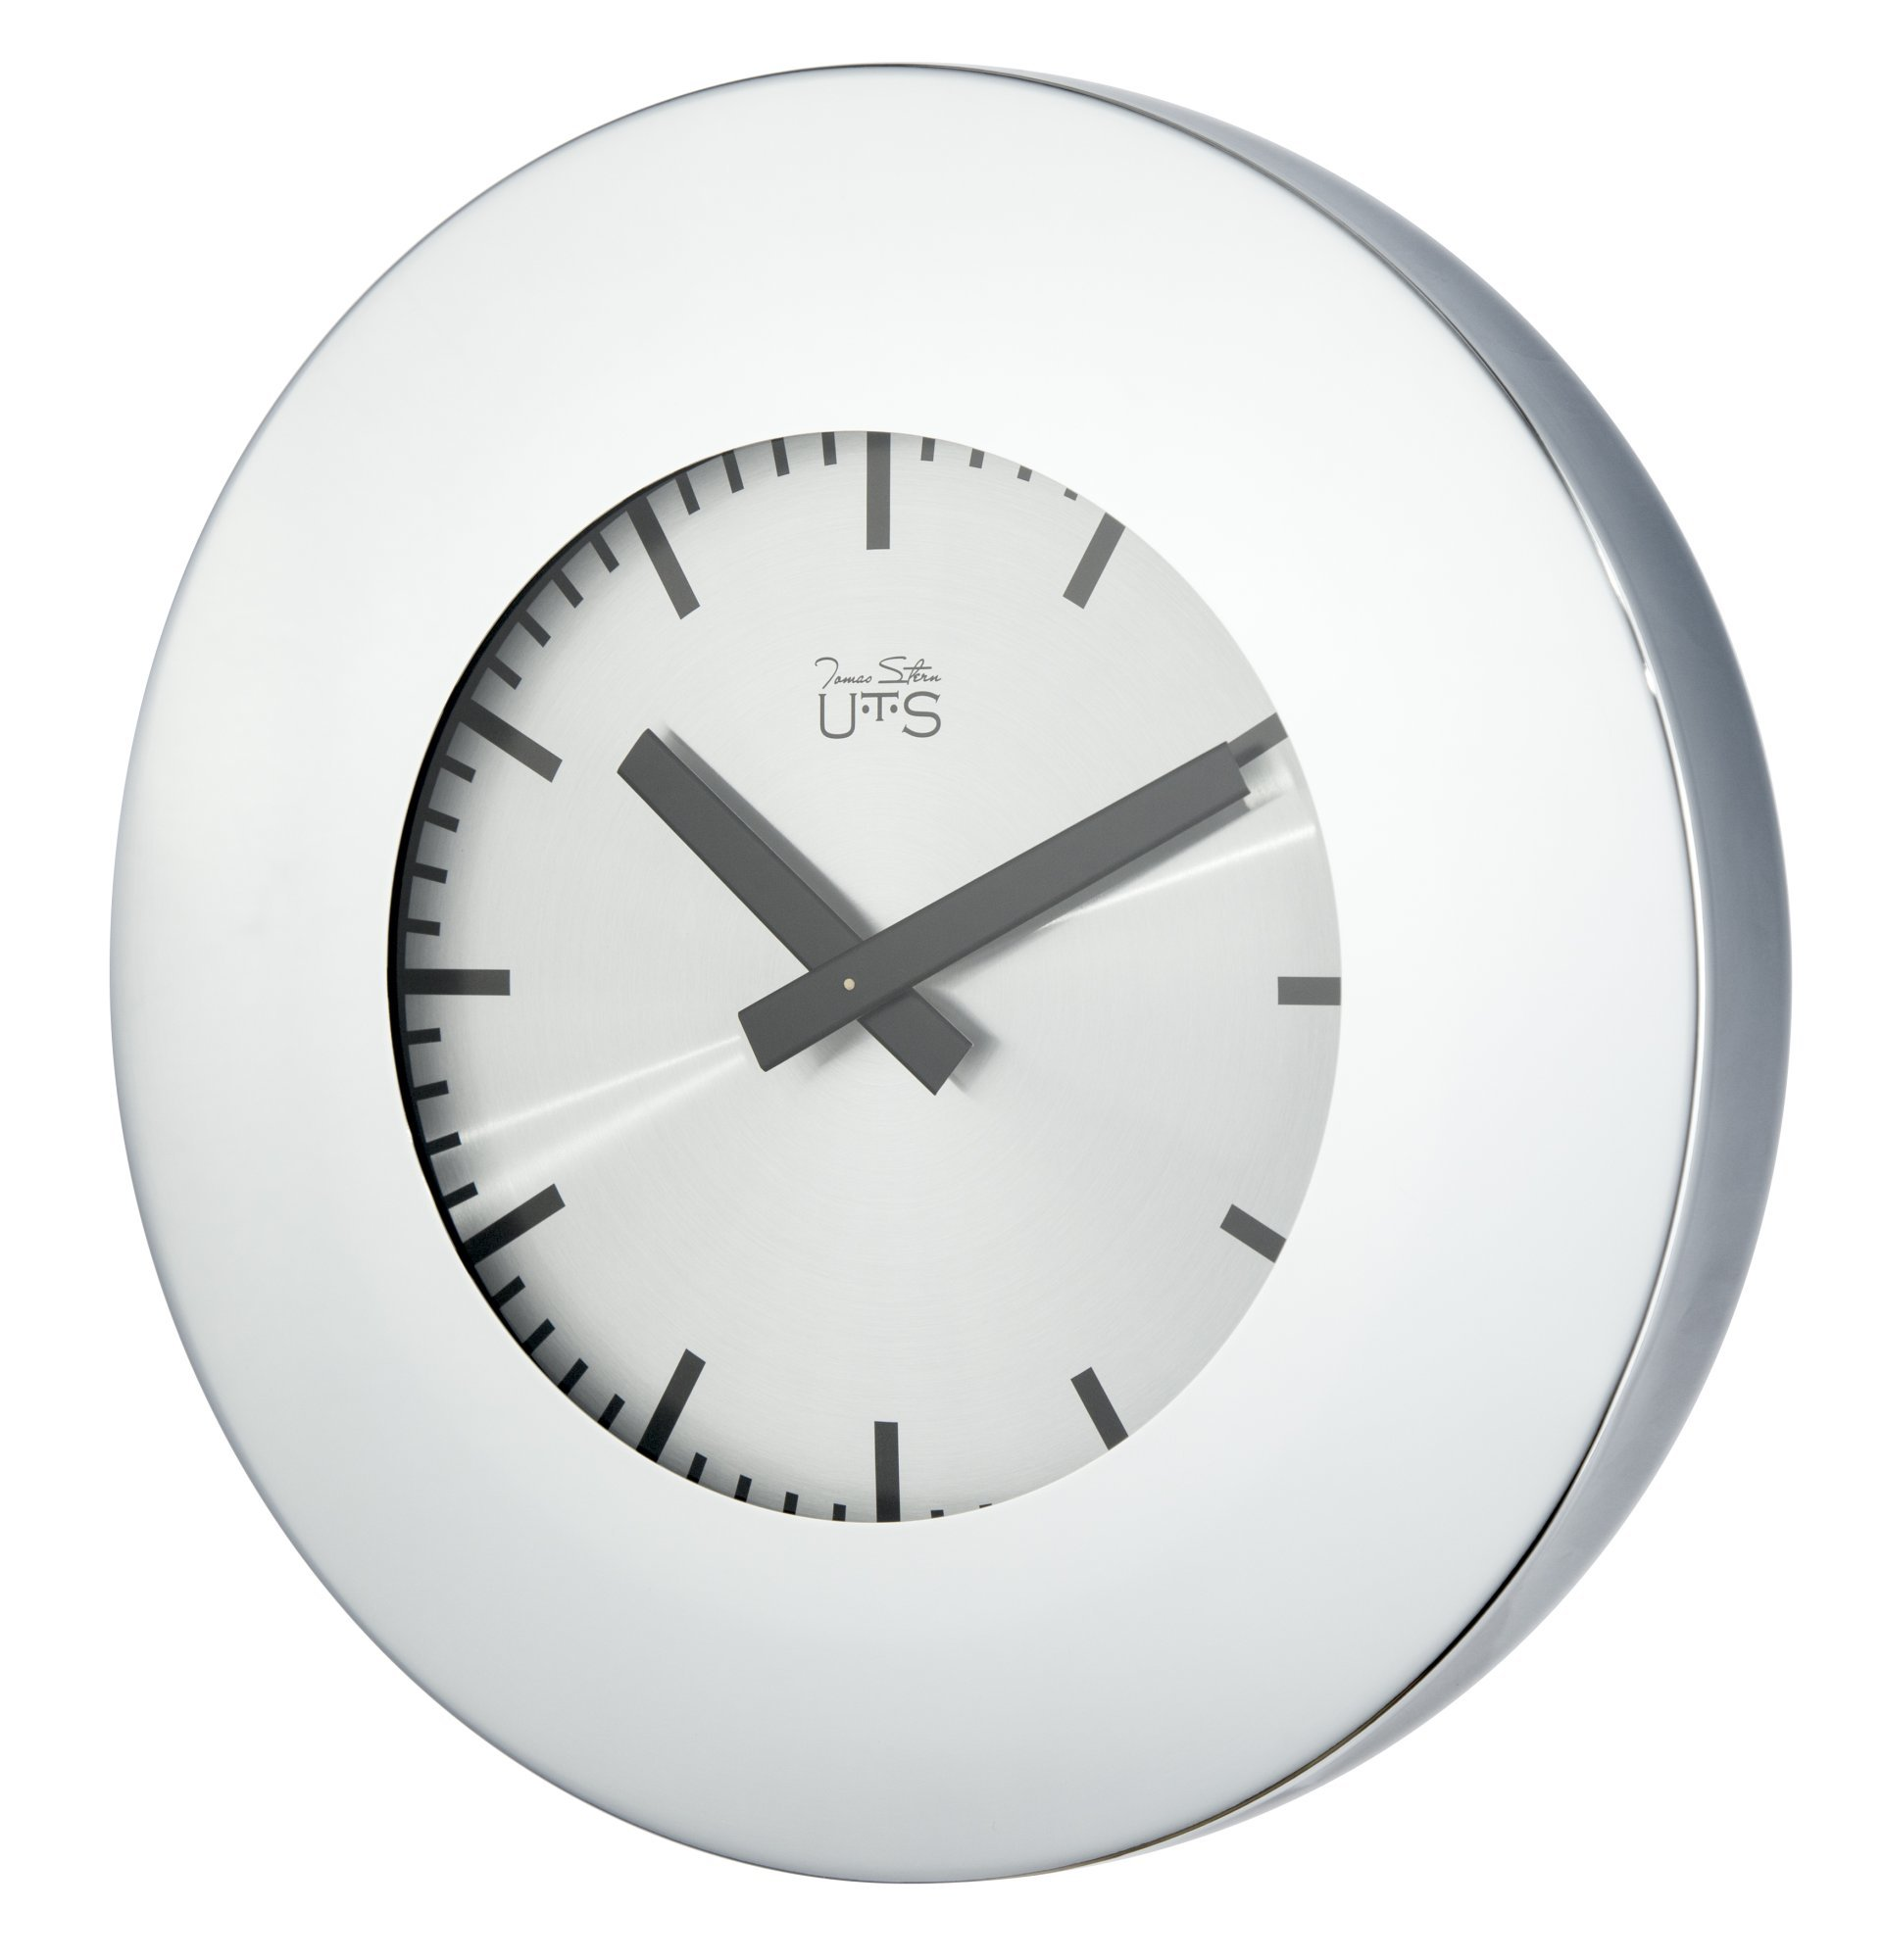 Часы настенные Часы настенные Tomas Stern 4011S chasy-nastennye-tomas-stern-4011s-germaniya.jpg